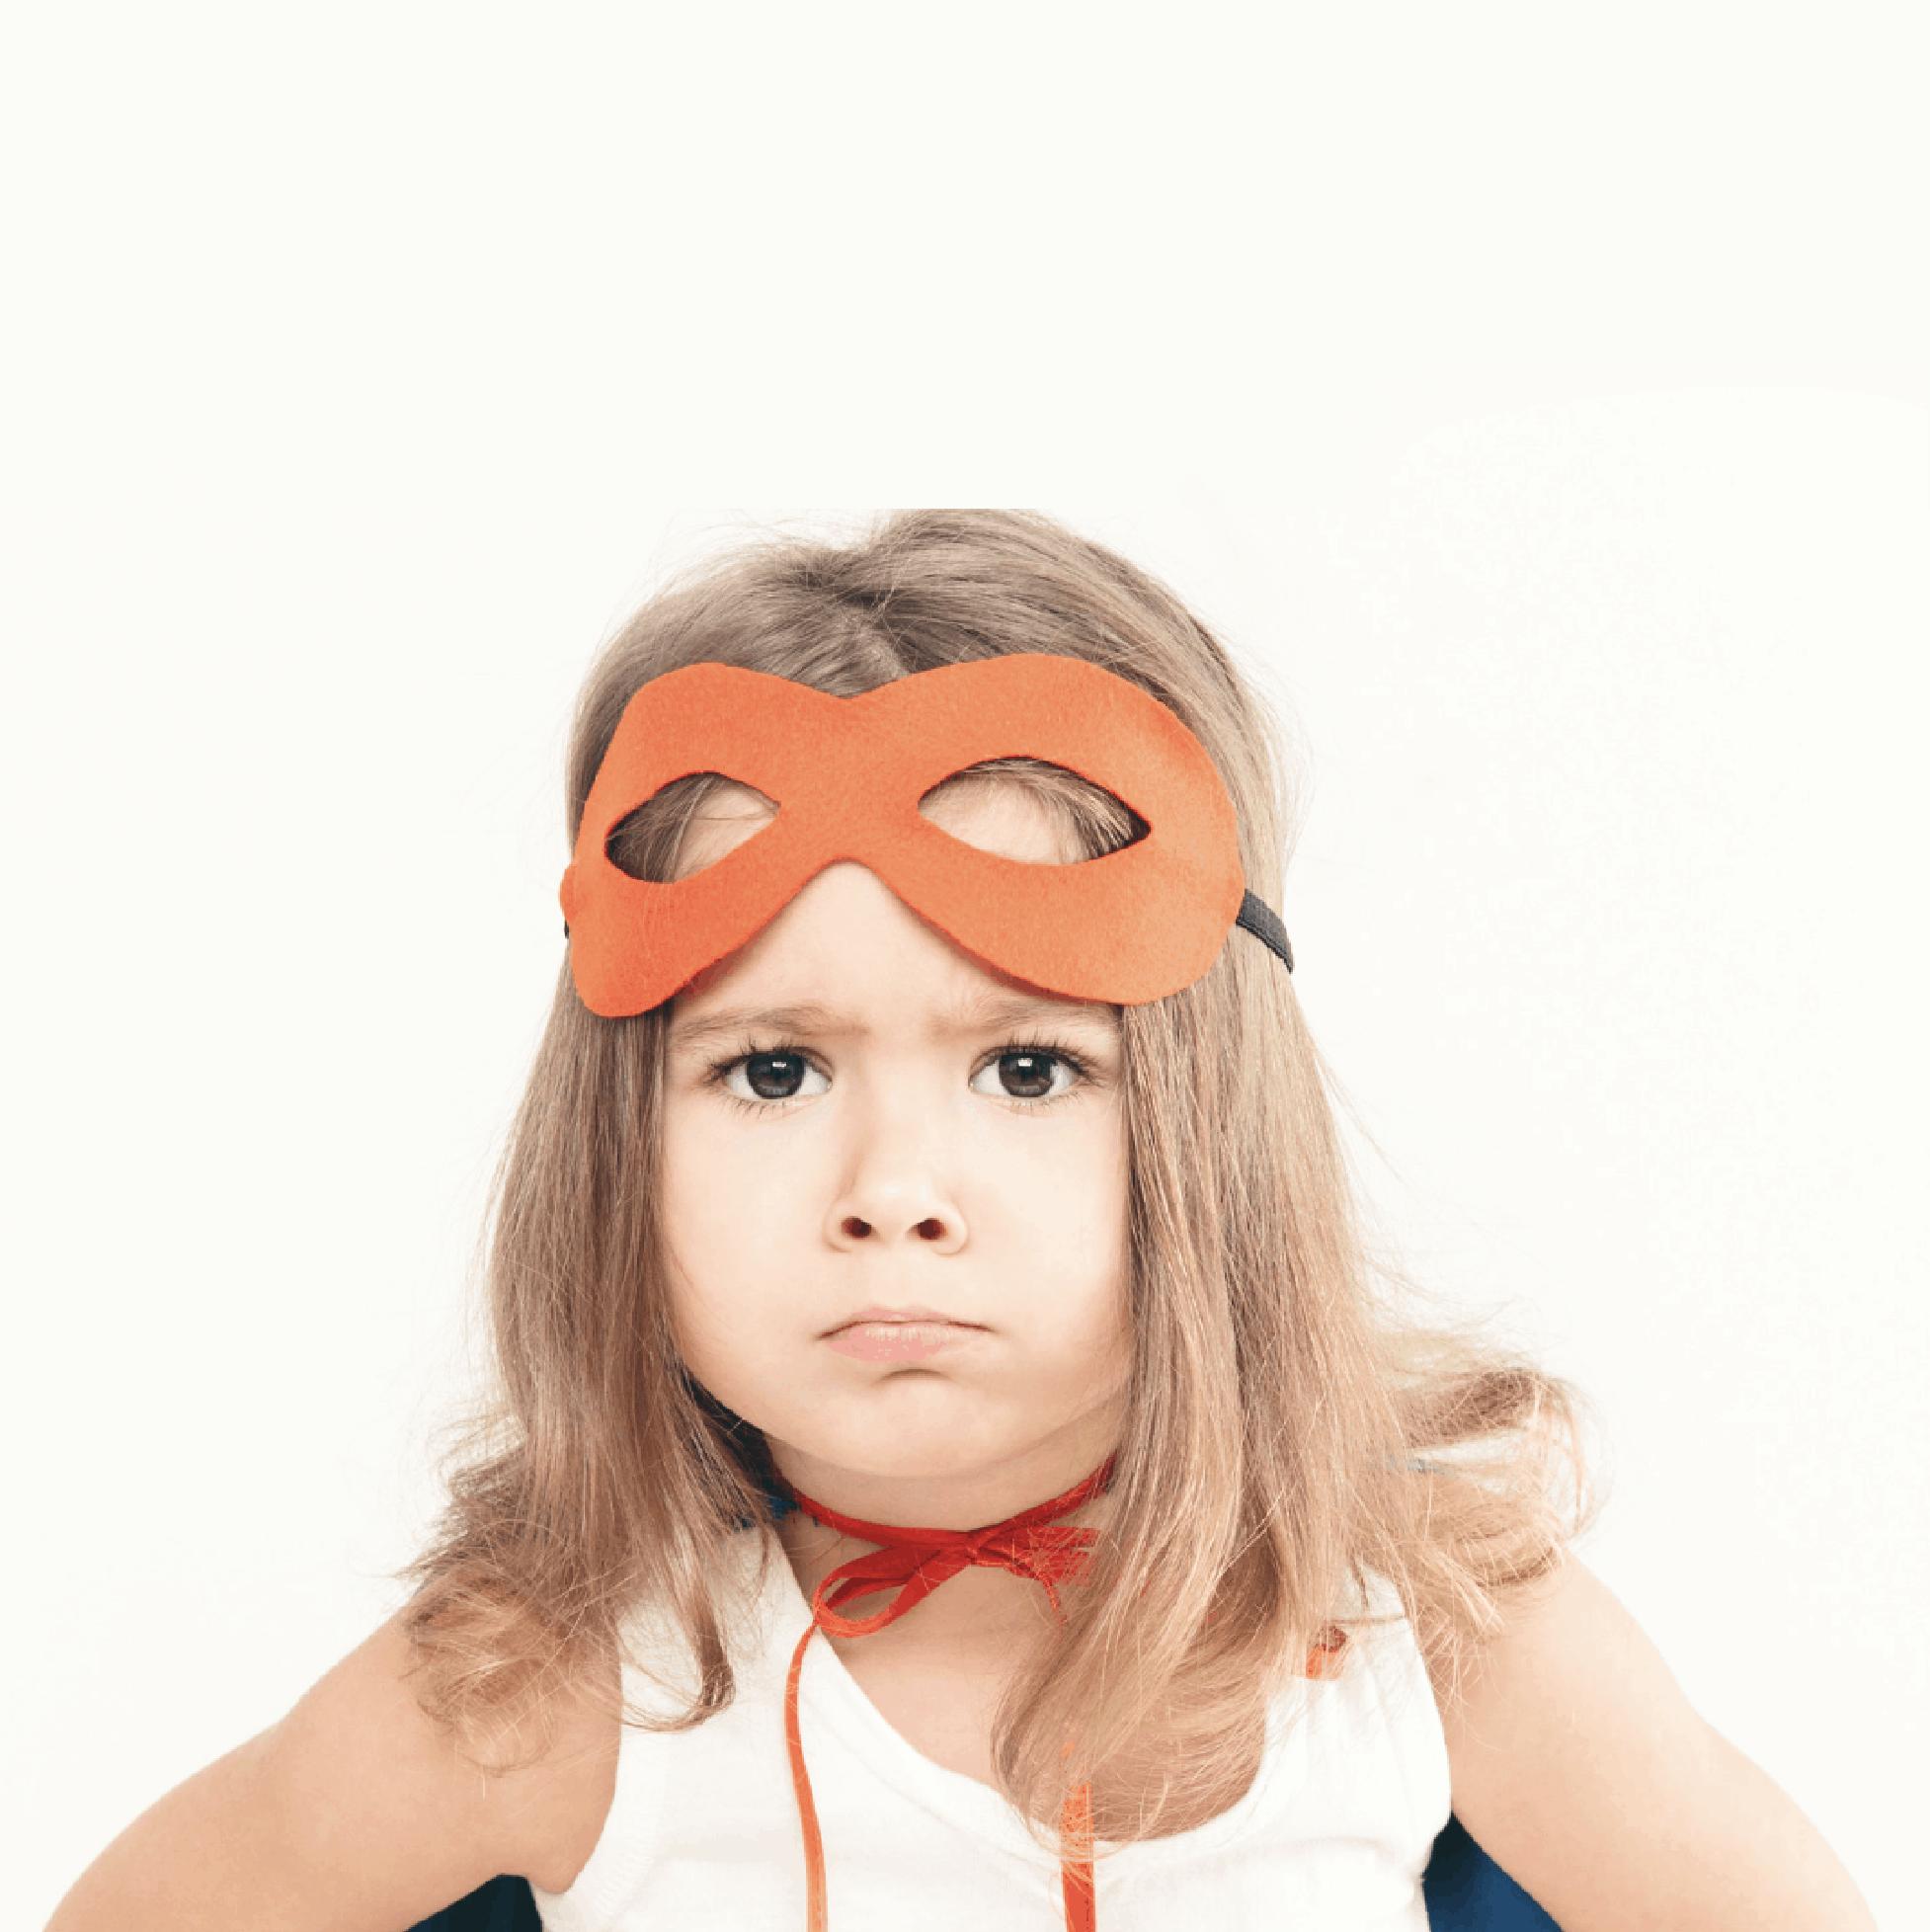 Innate-therapies-childrens-emotions-blog-image-1